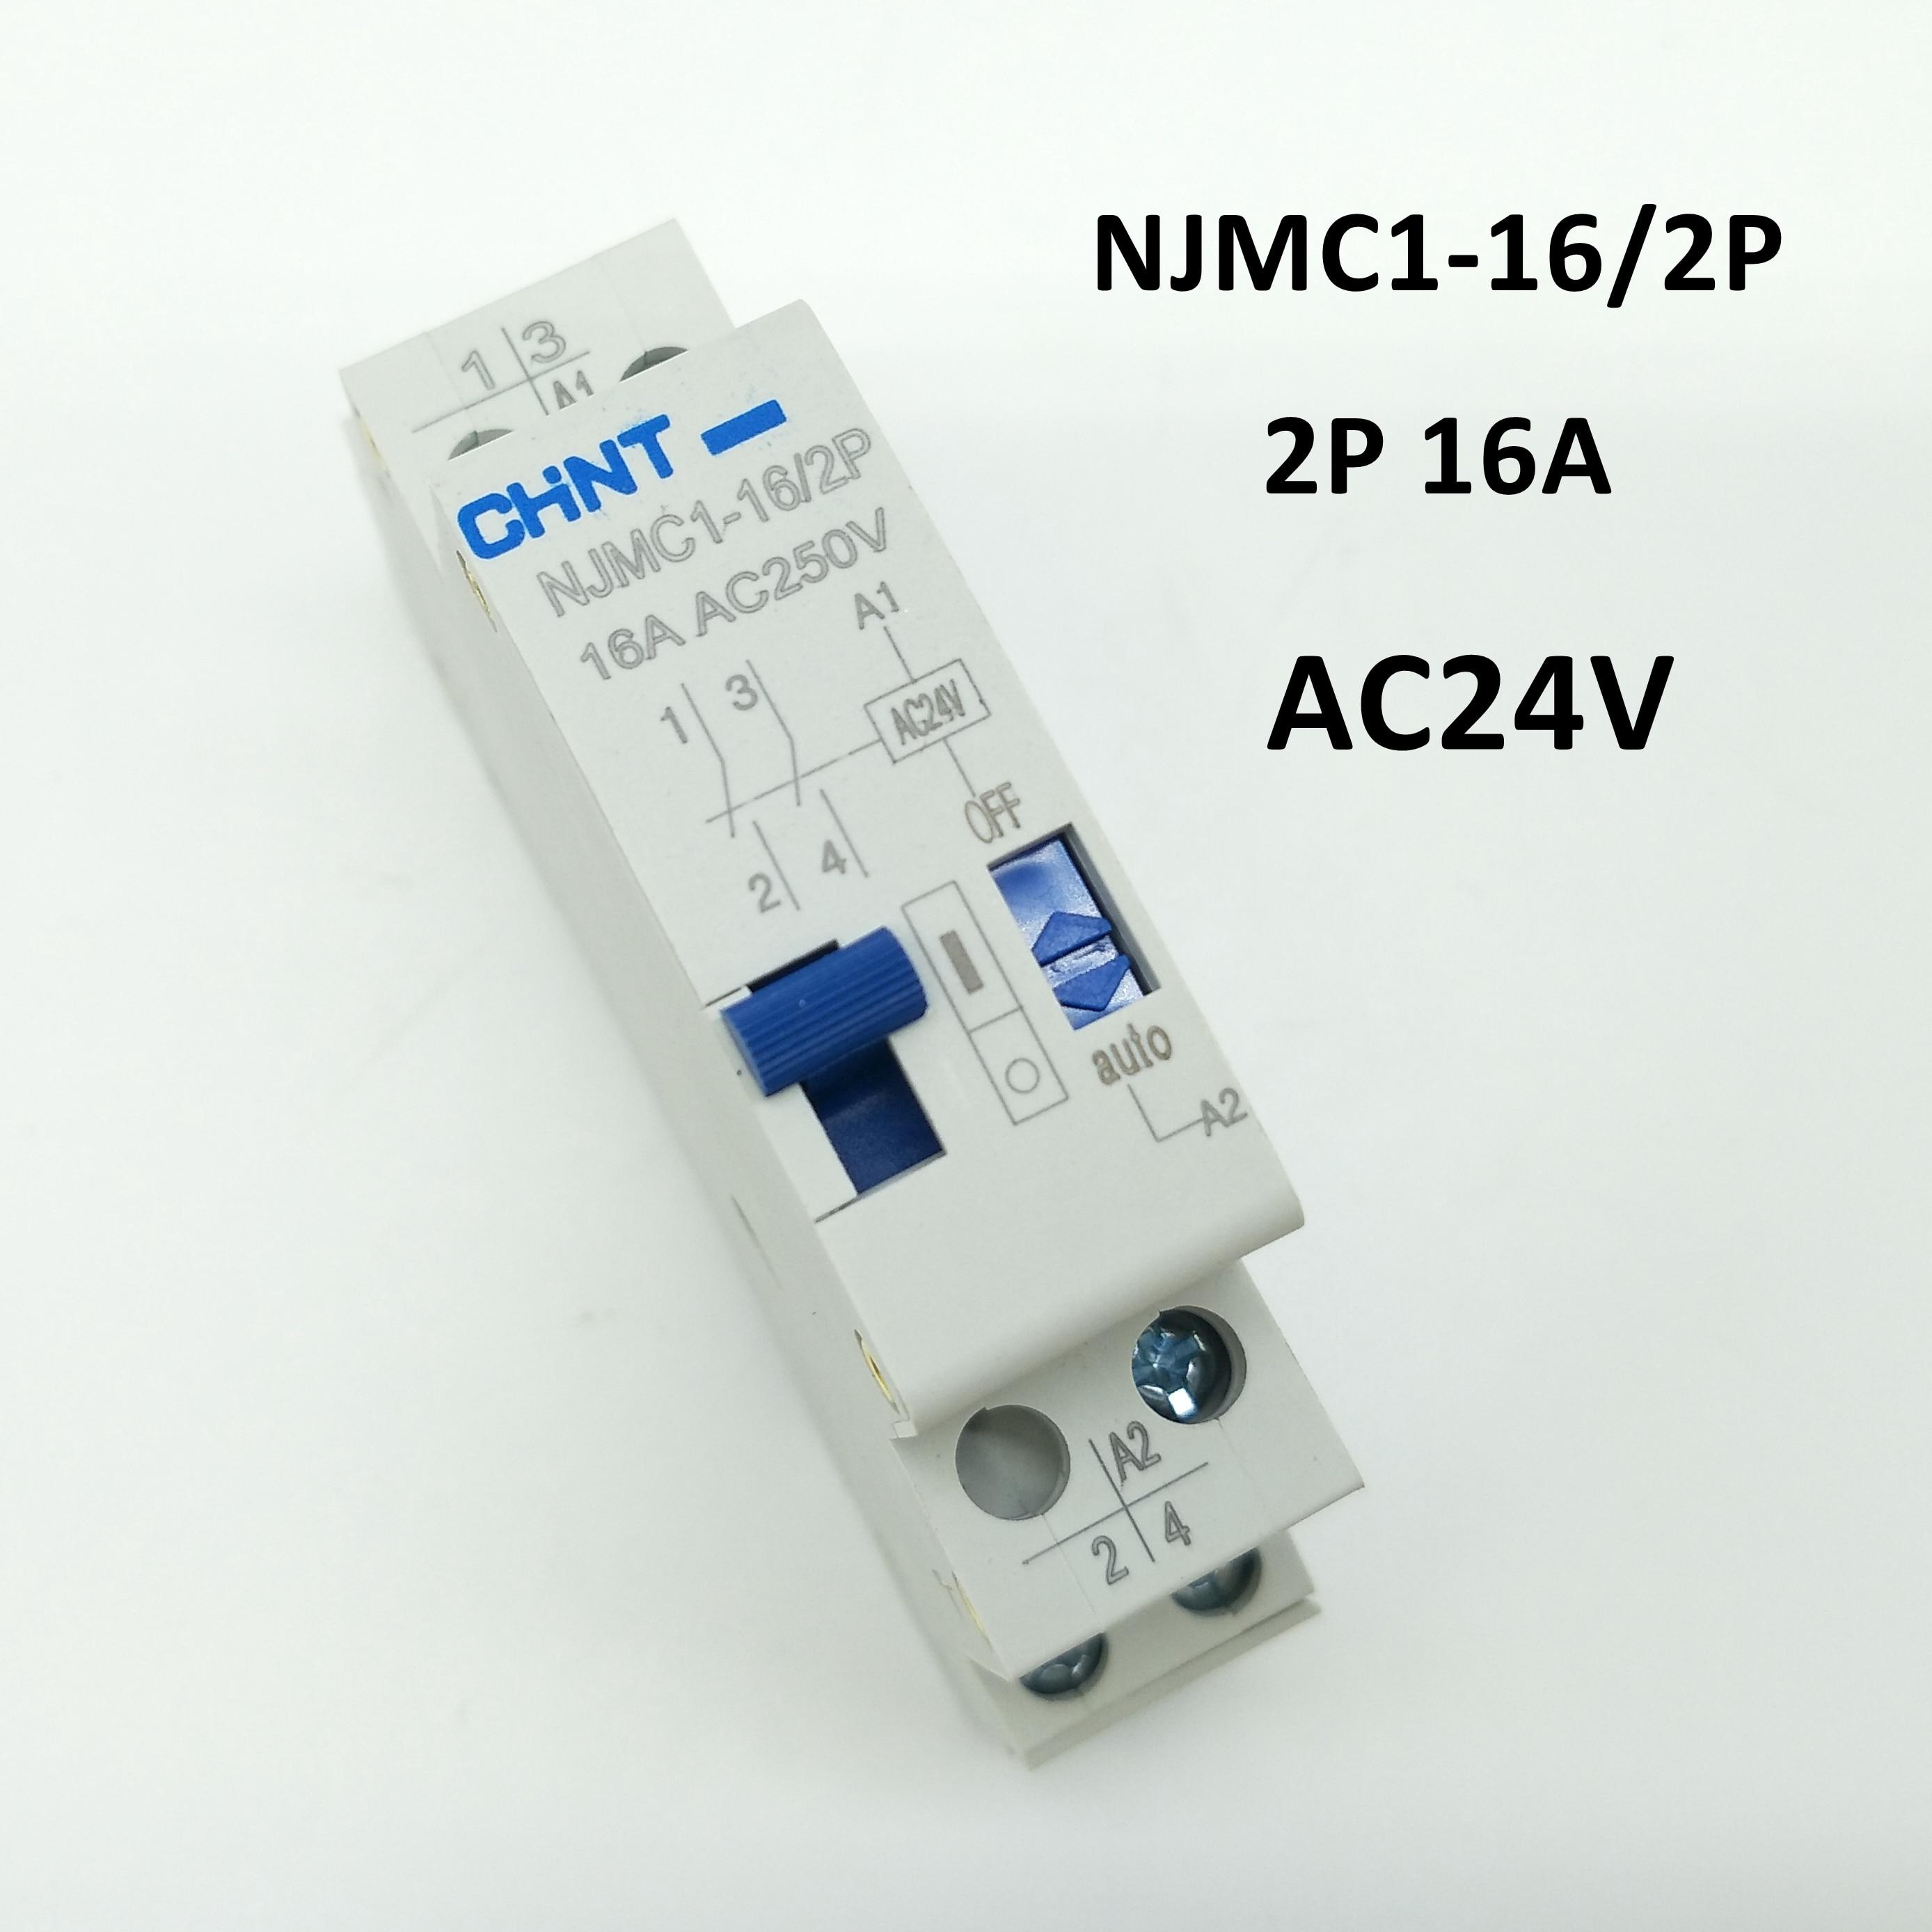 Relé de Pulso CHINT NJMC1-16/2 P 16A AC24V relé de Control